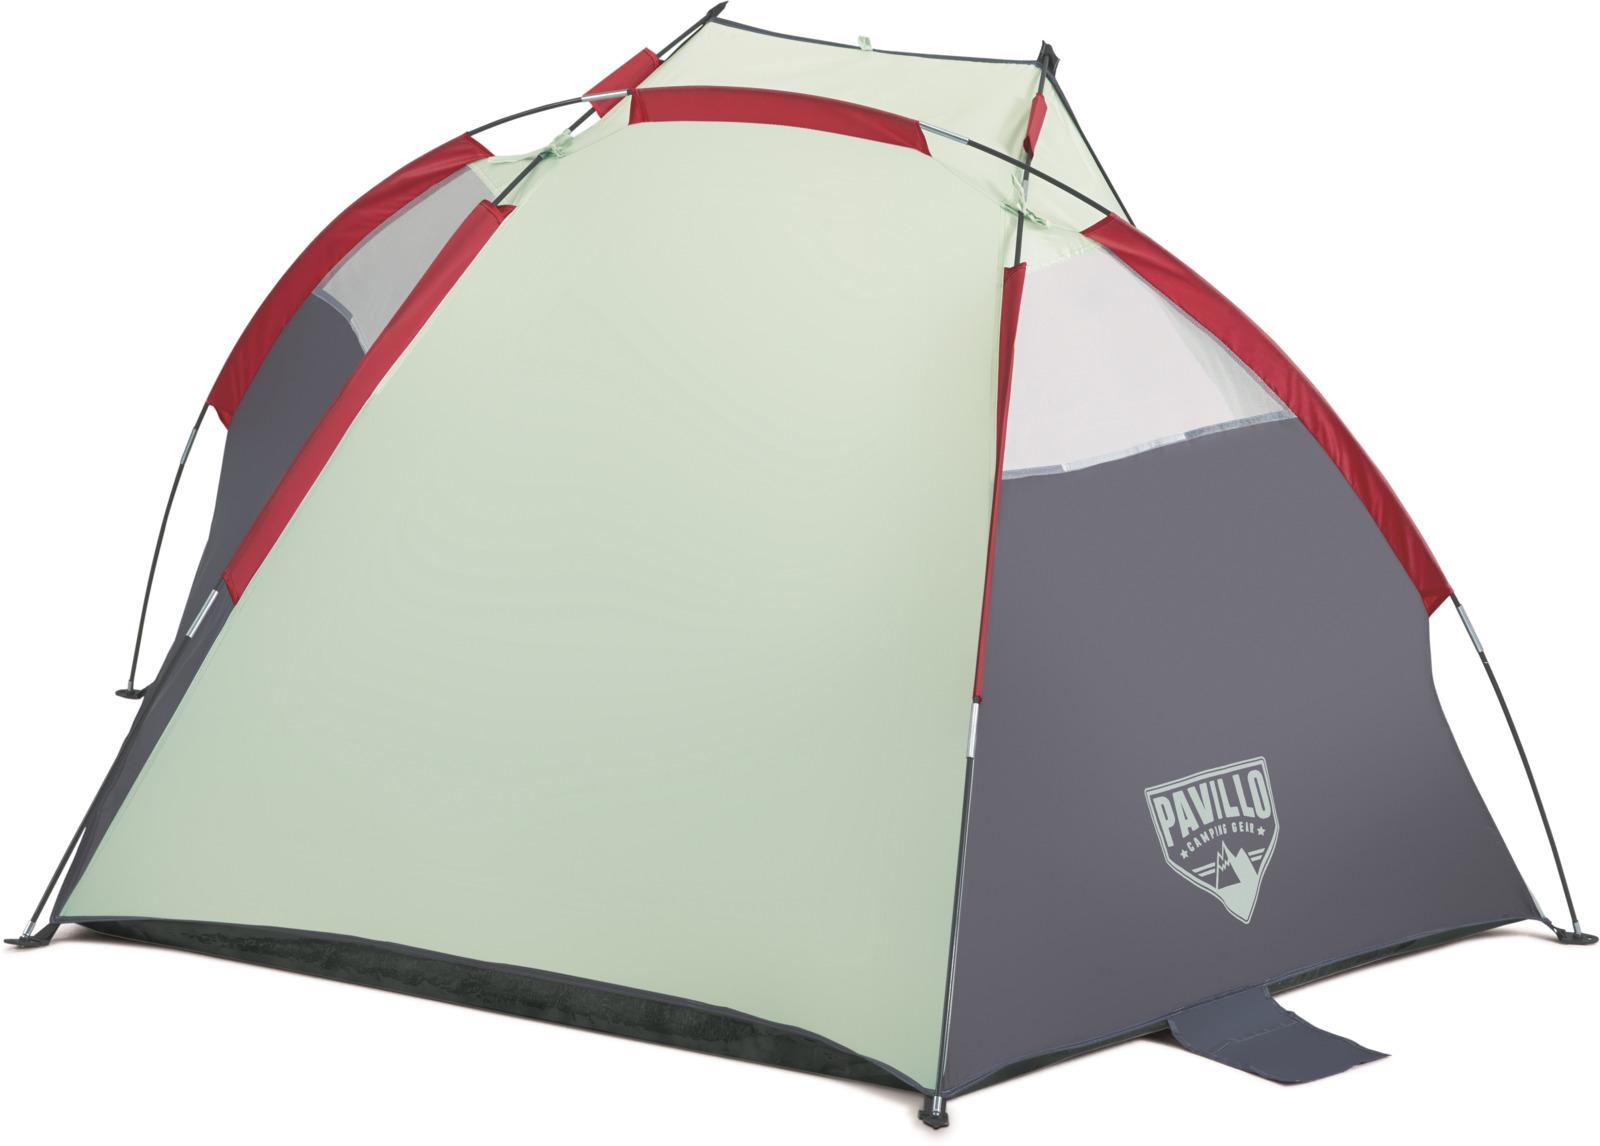 Bestway Палатка пляжная Ramble, 200 х 100 х 100 см. 68001